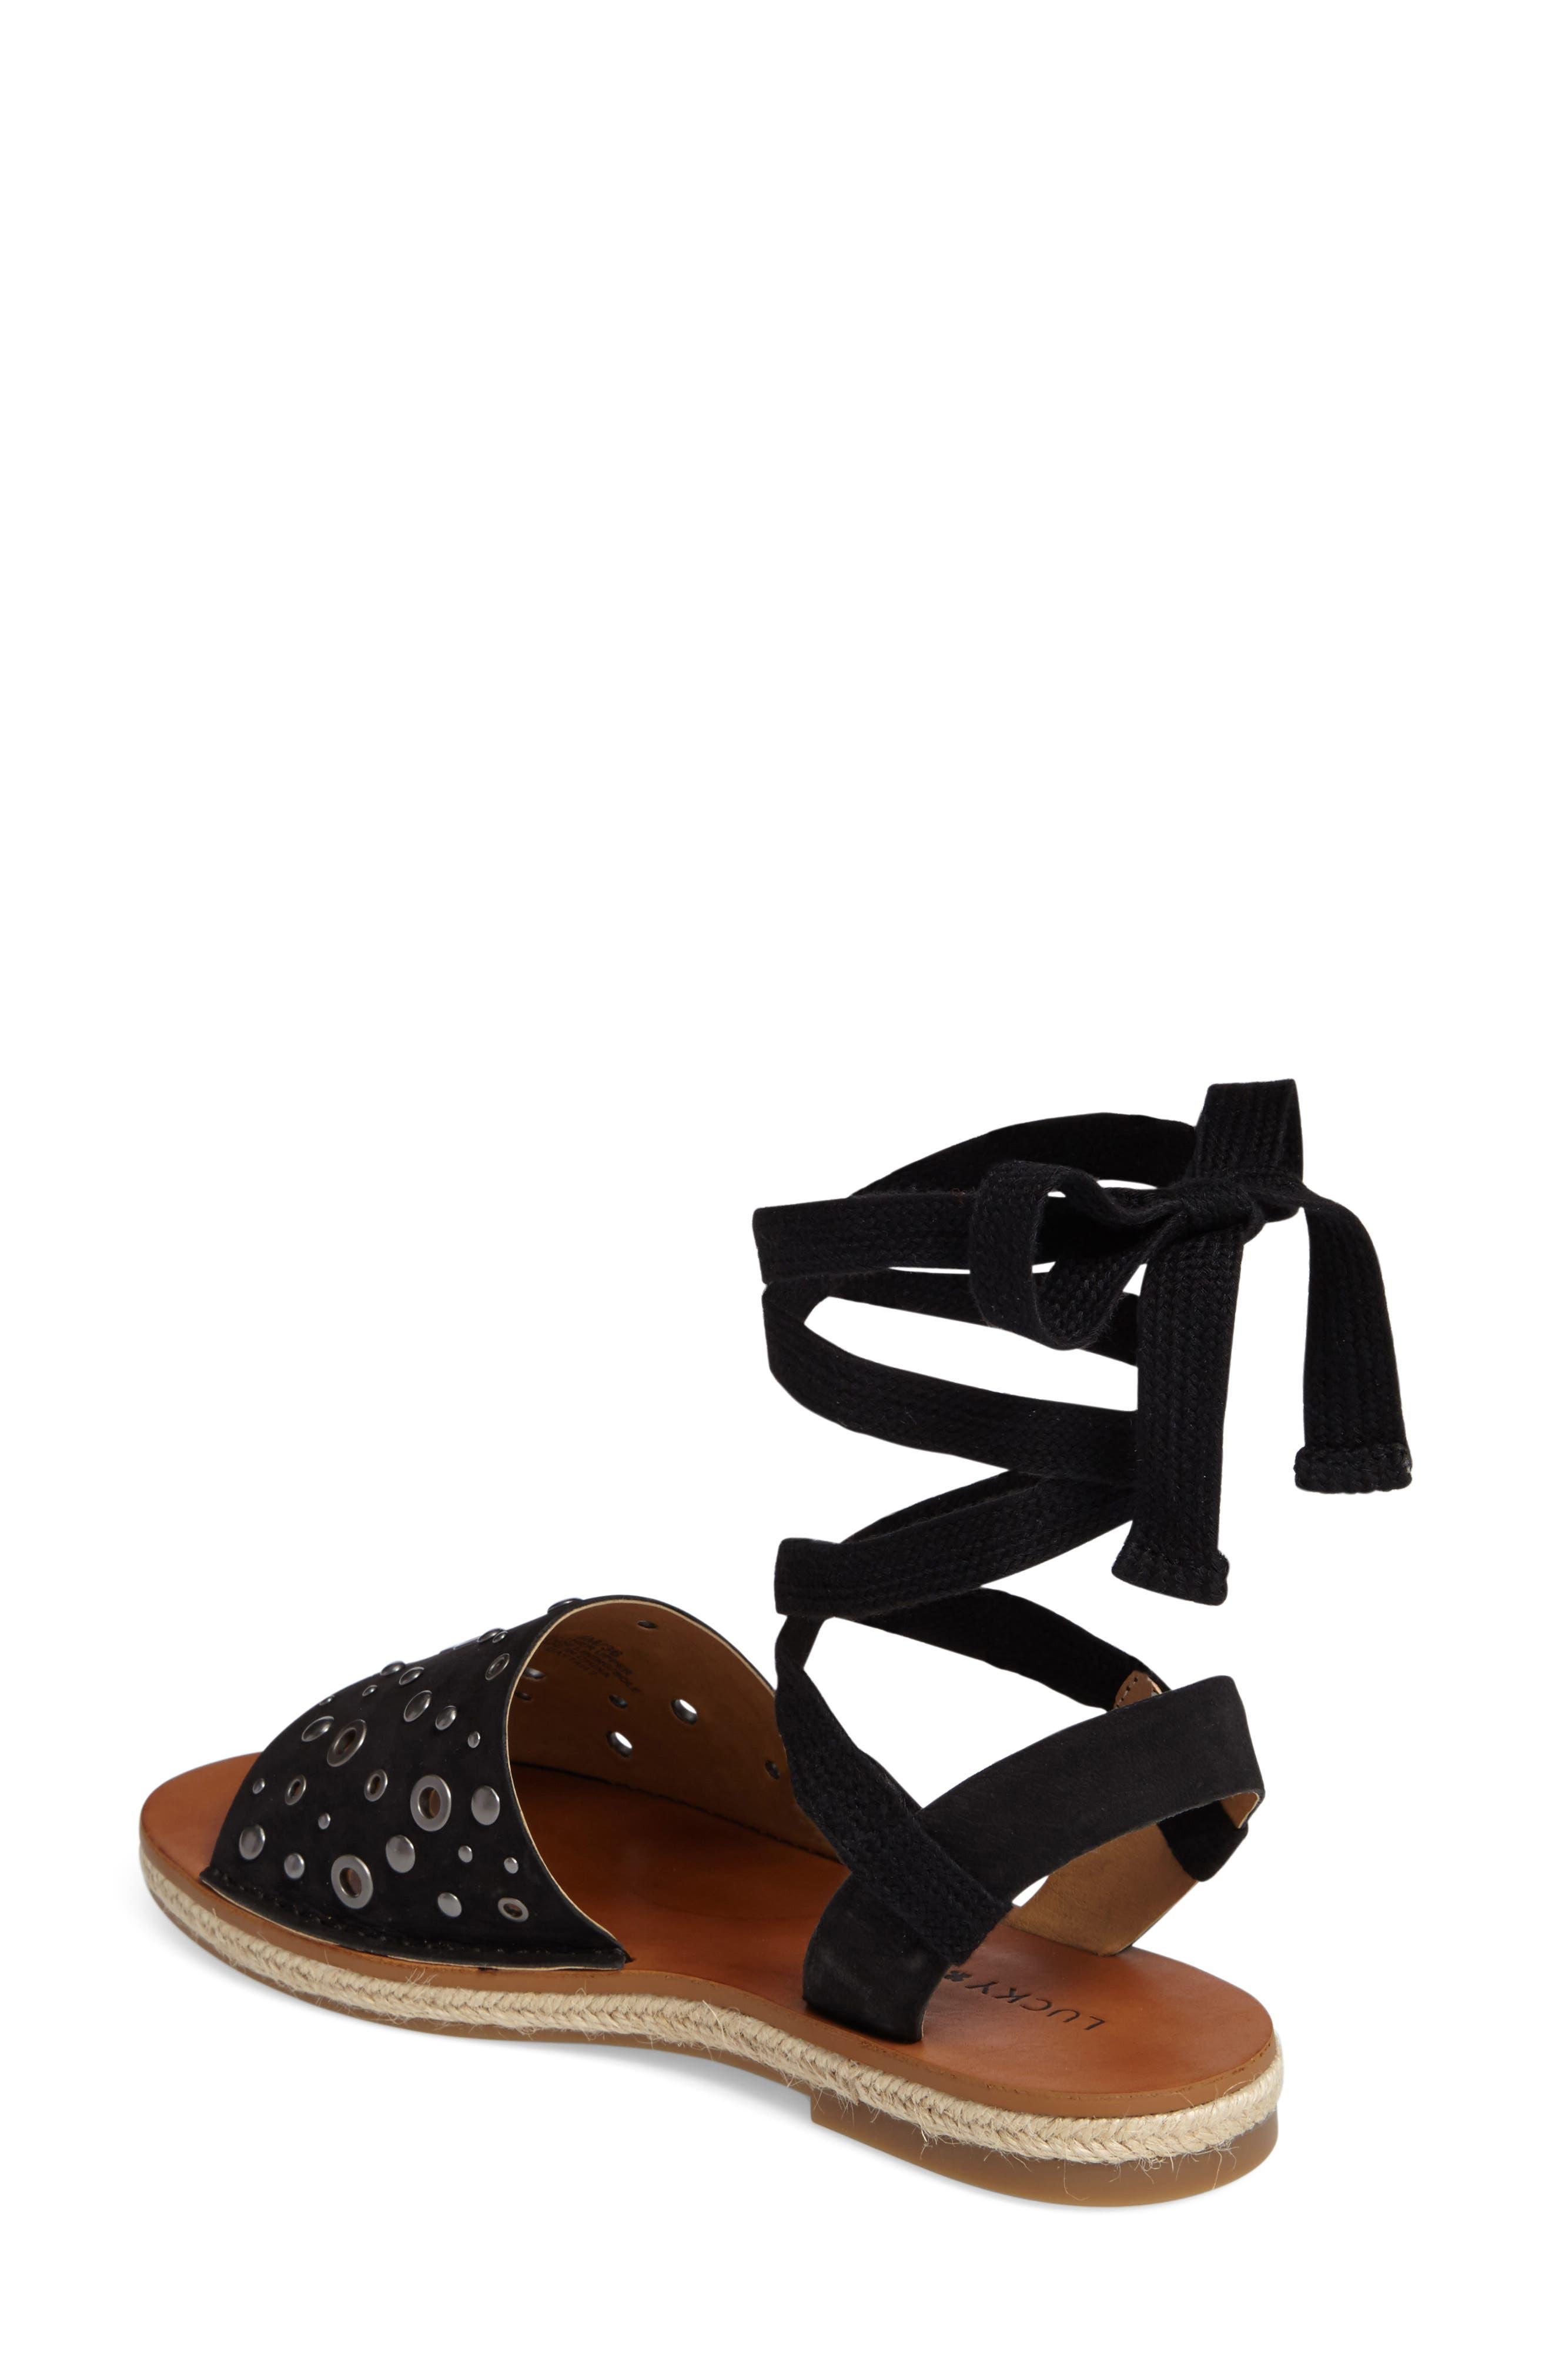 Daytah Ankle Tie Sandal,                             Alternate thumbnail 5, color,